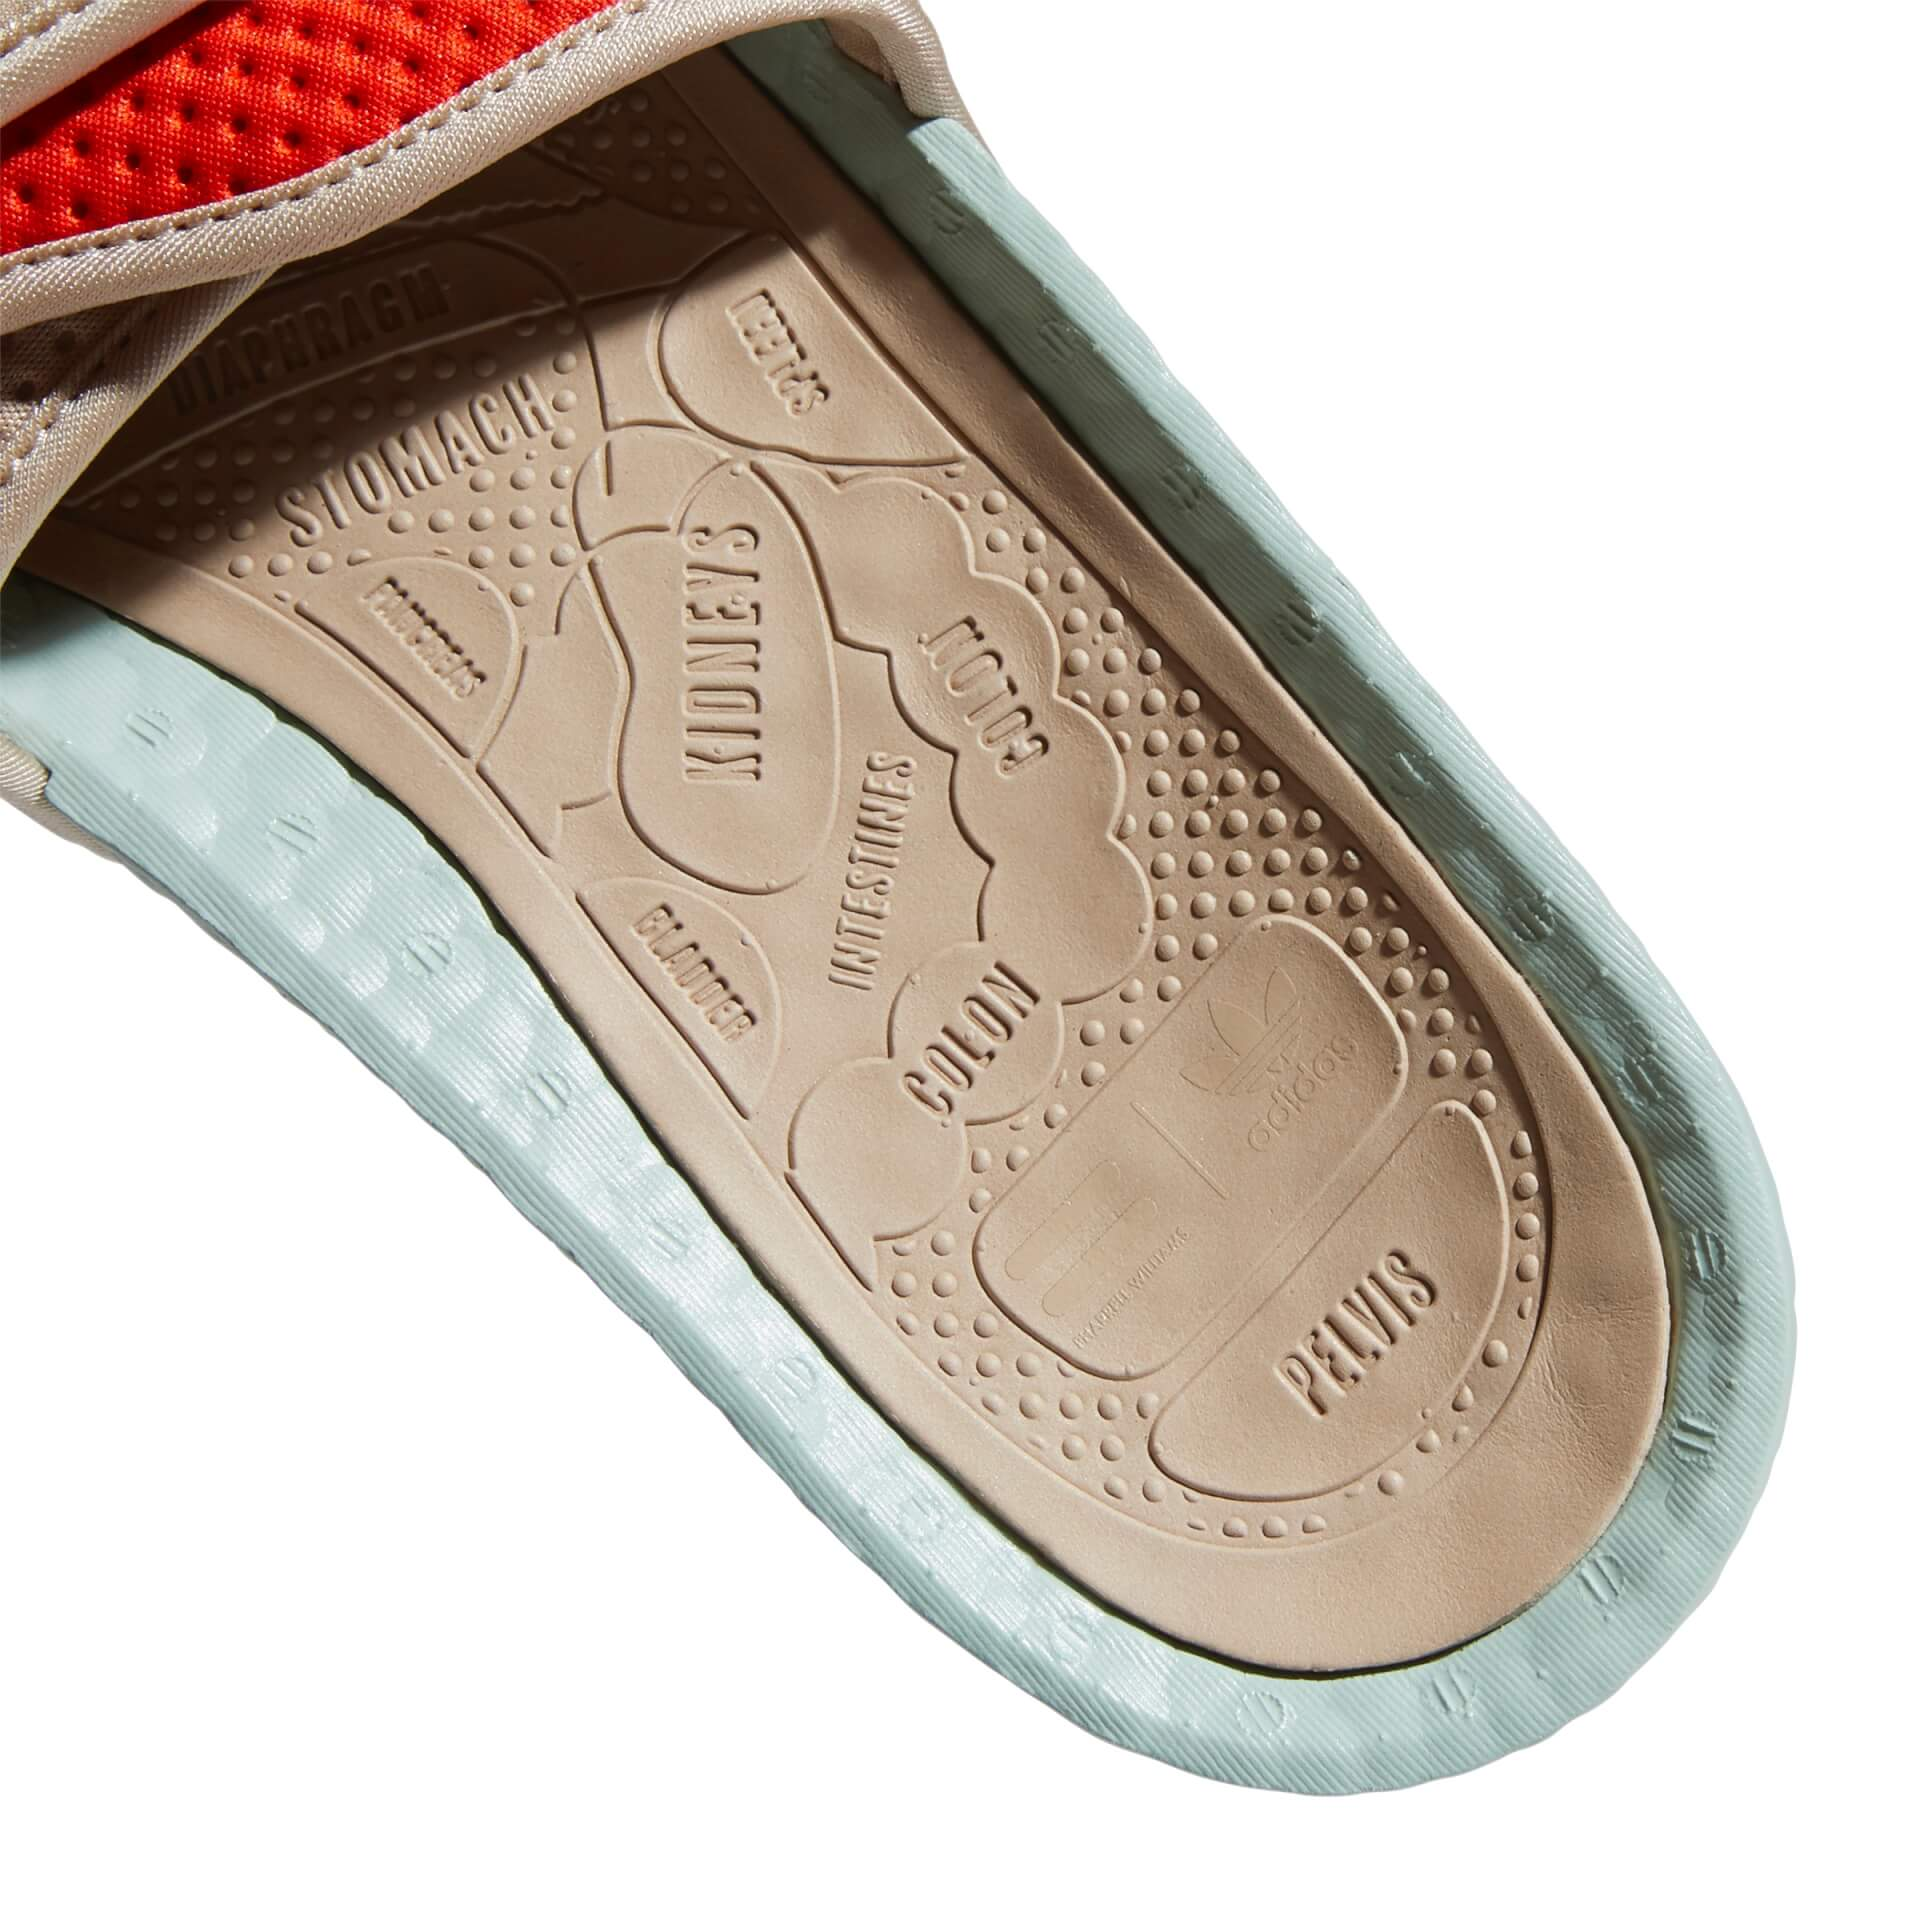 adidas Originalsから『Pharrell Williams x NIGO(R)FRIENDSHIP PACK』が発売!2種類のフットウェアが登場 fashion201217_adidas_pharrell_nigo_15